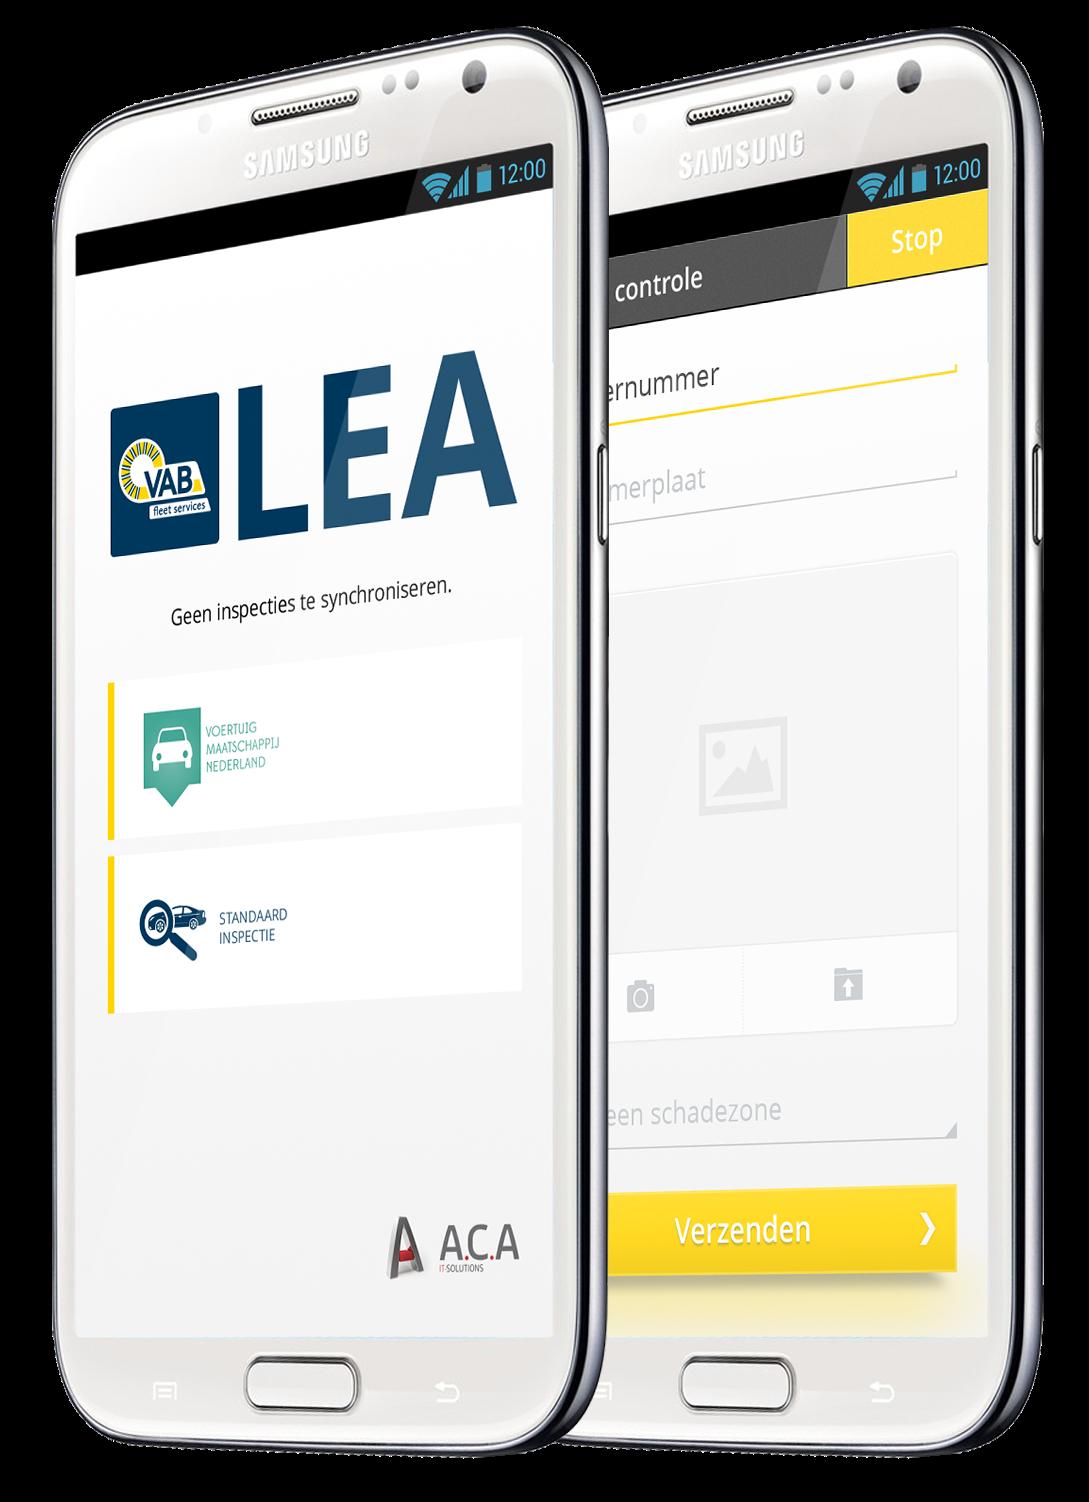 LEA inspection app VAB Fleet services